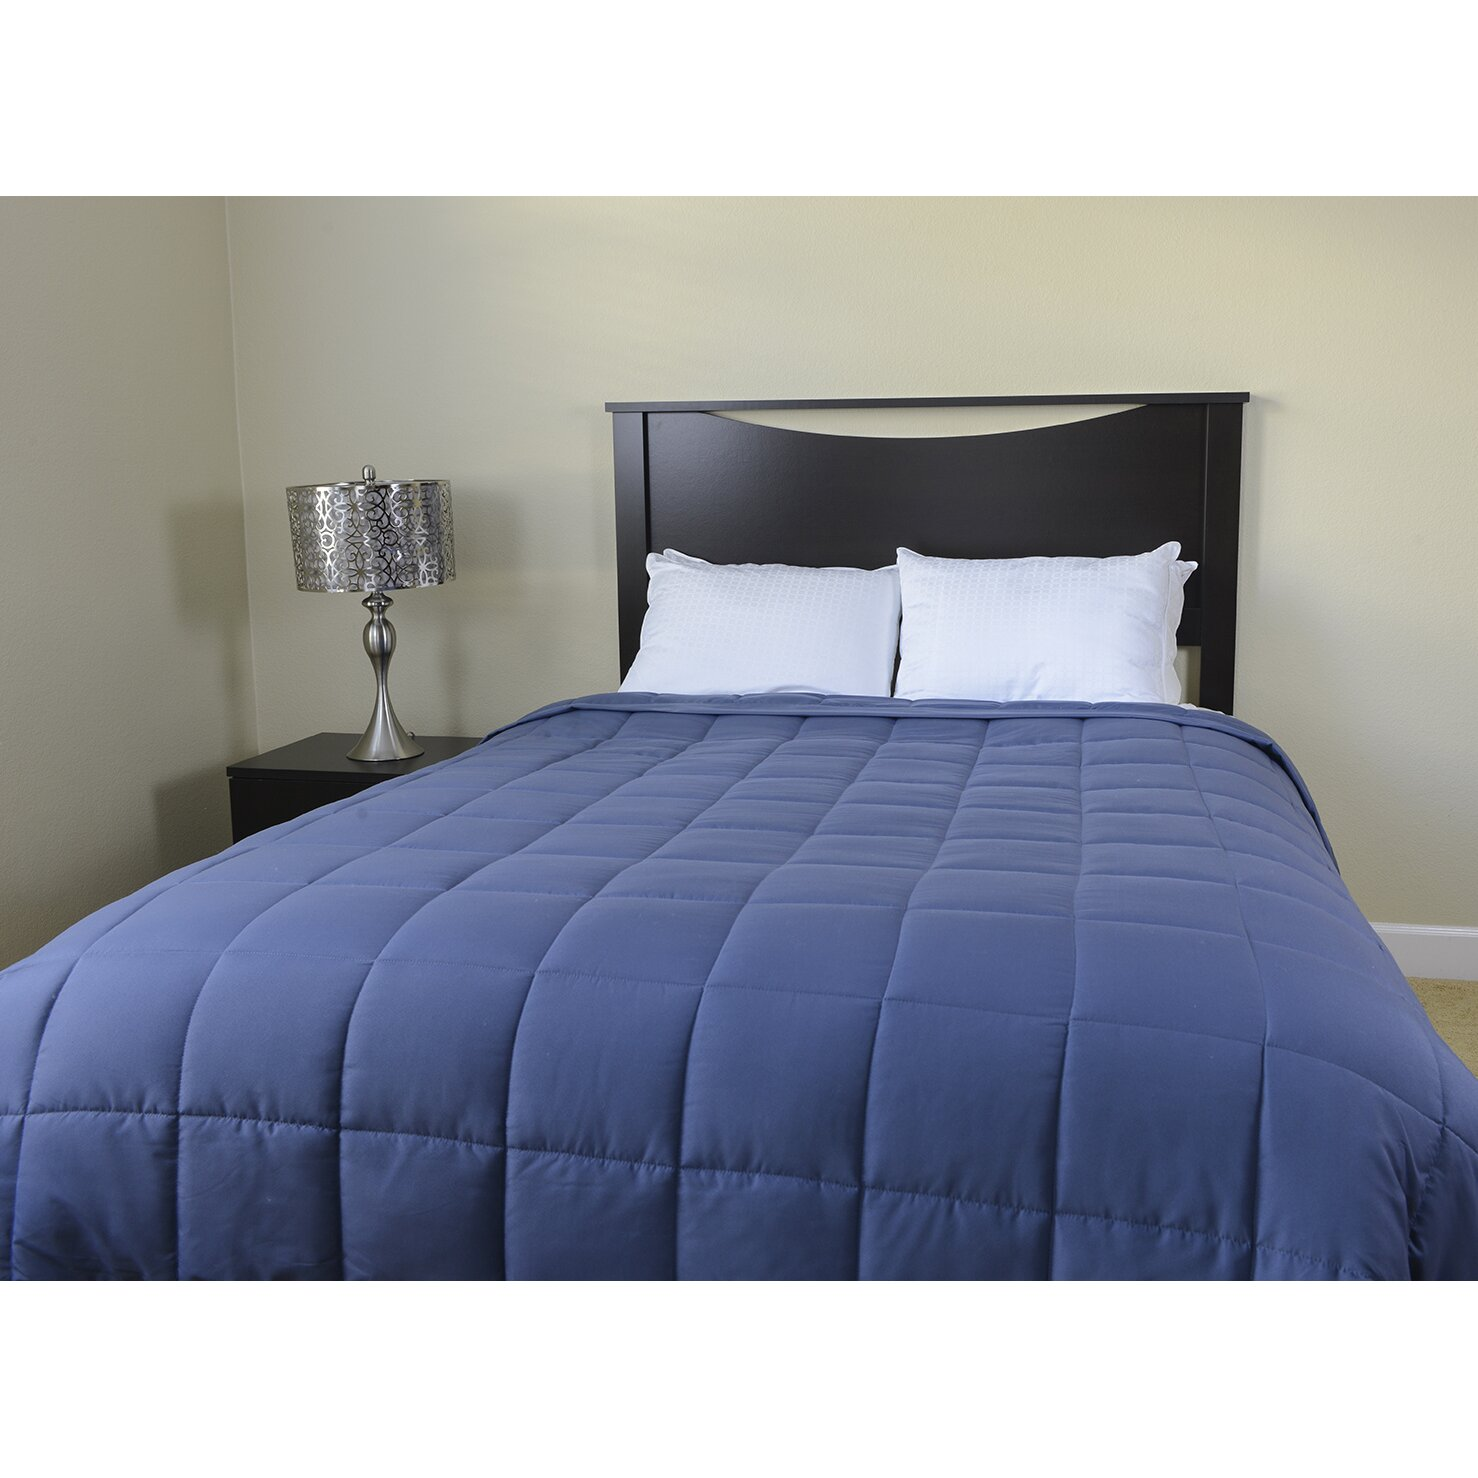 Luxlen Down Alternative Throw Blanket Wayfair